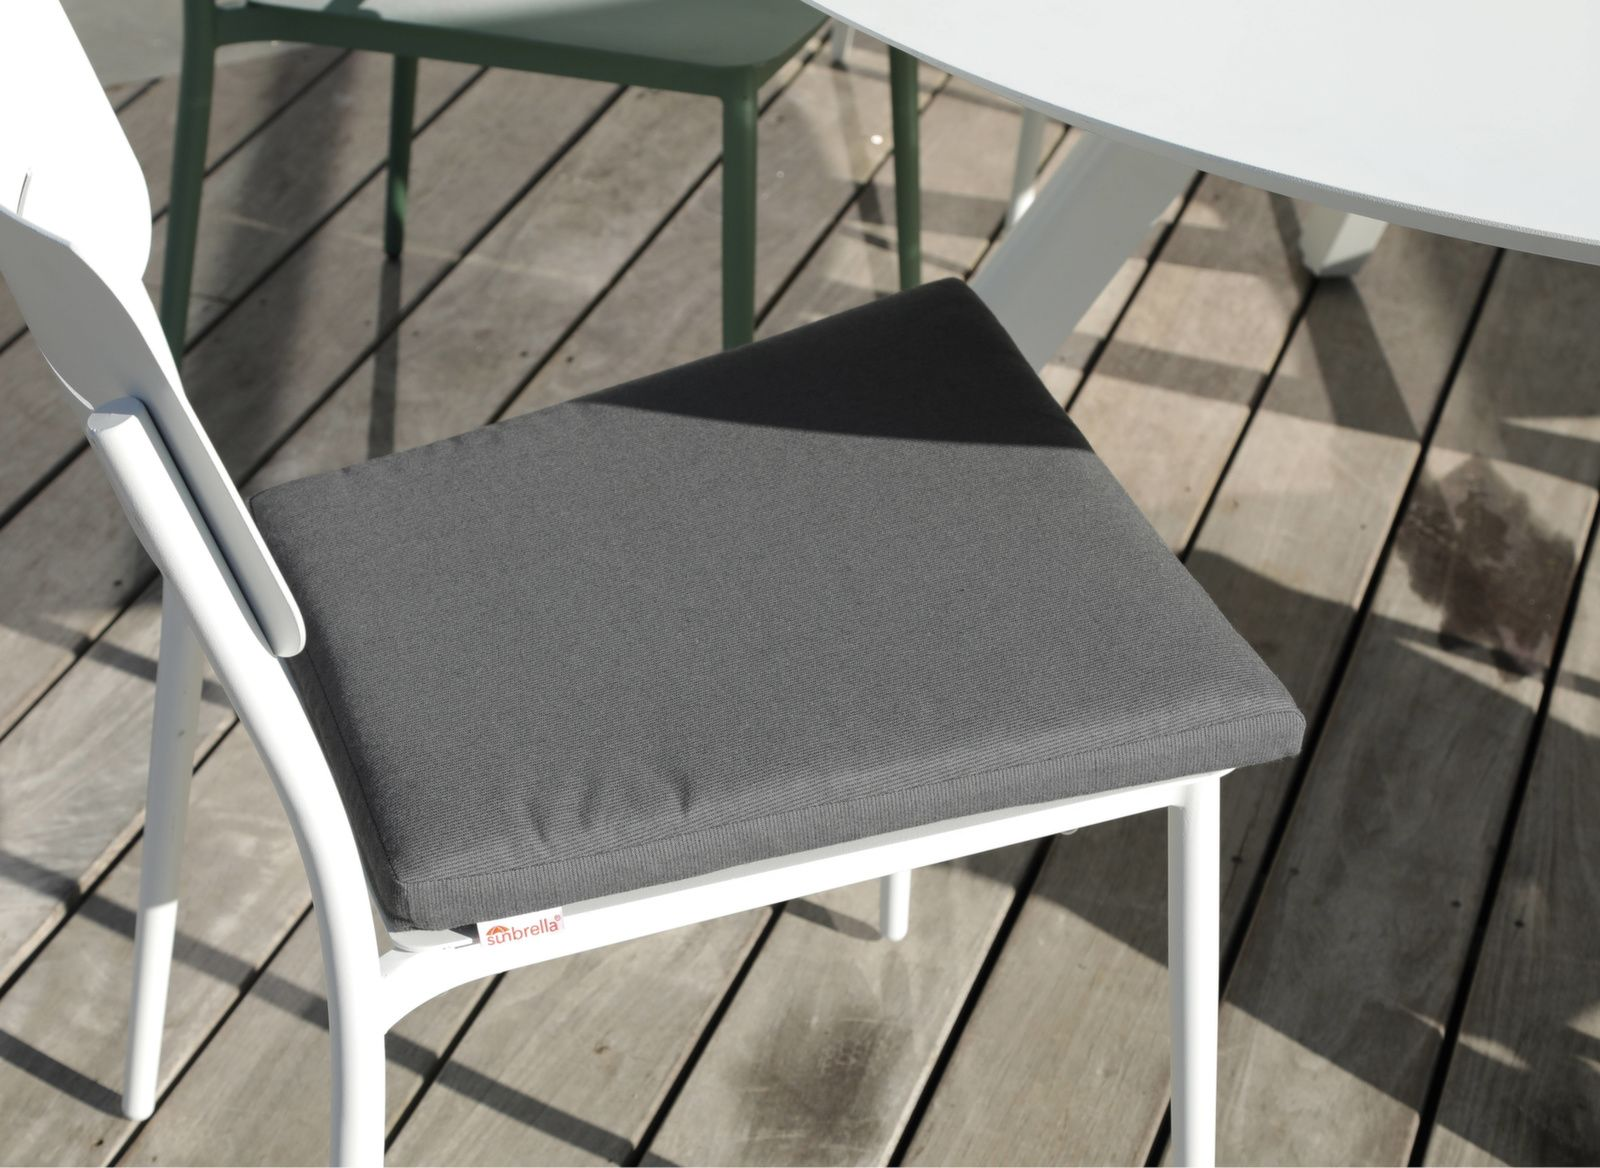 Galette d'assise Chic Sunbrella®